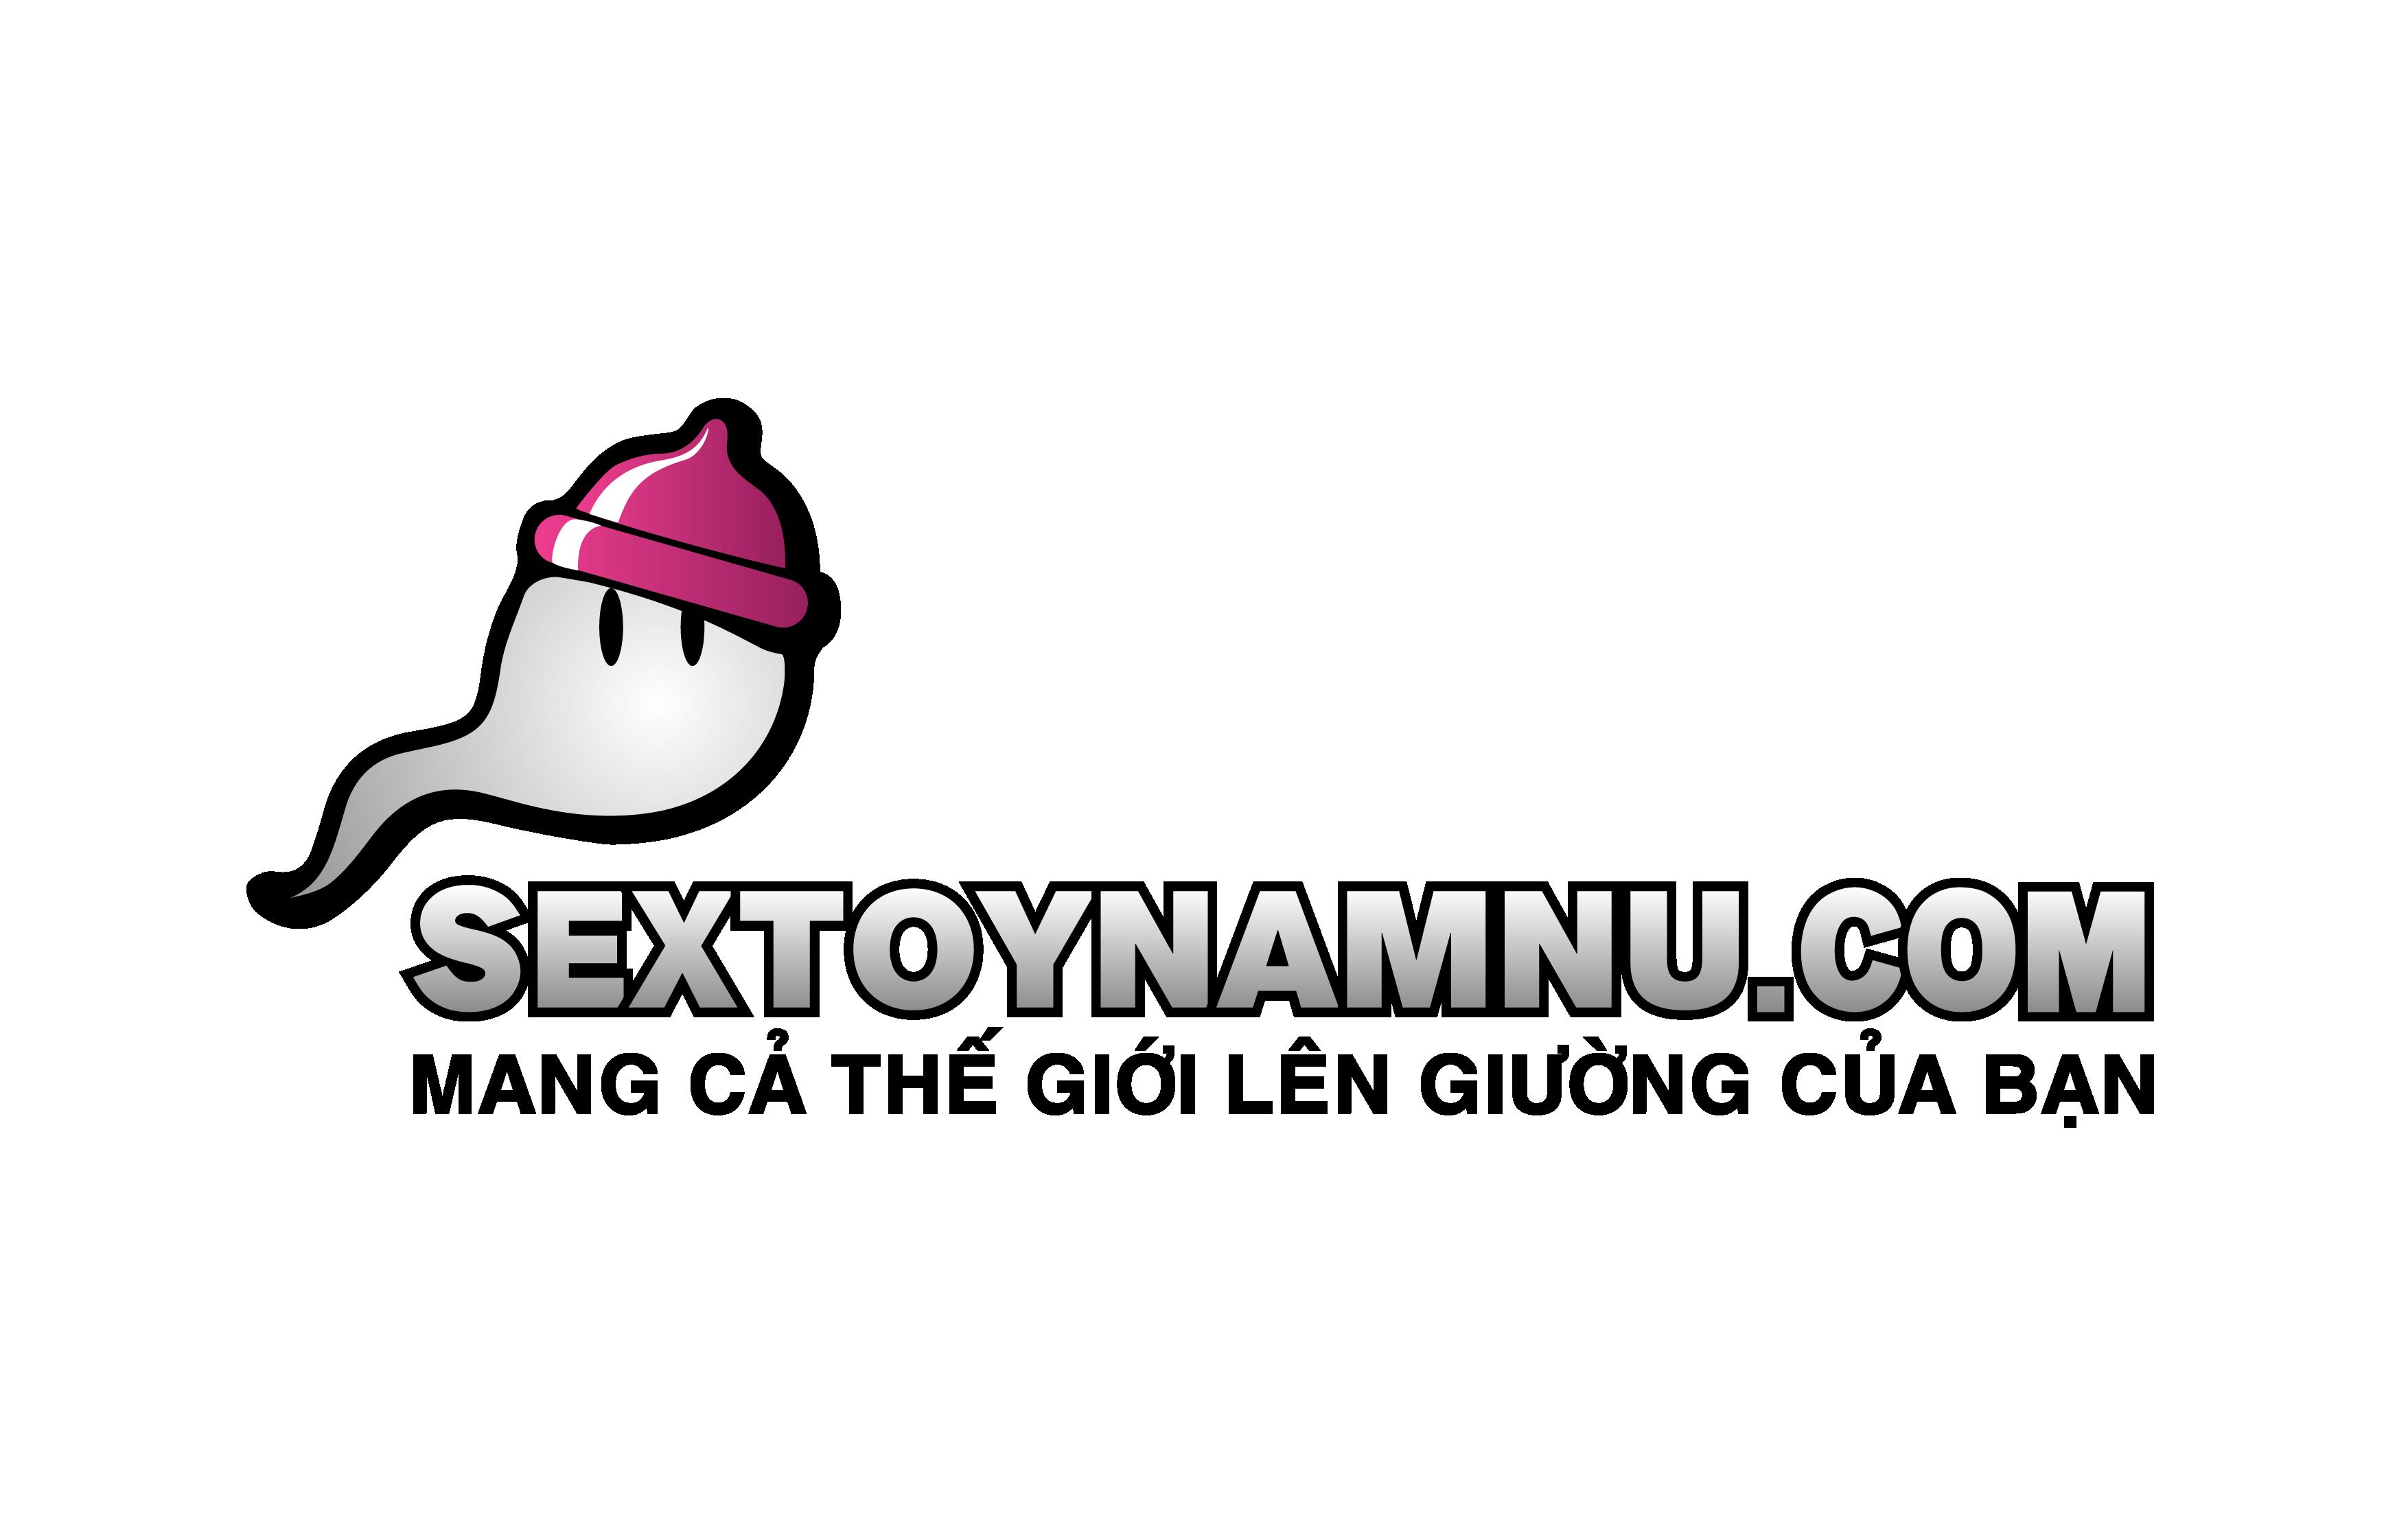 Logo sextoynamnu.com